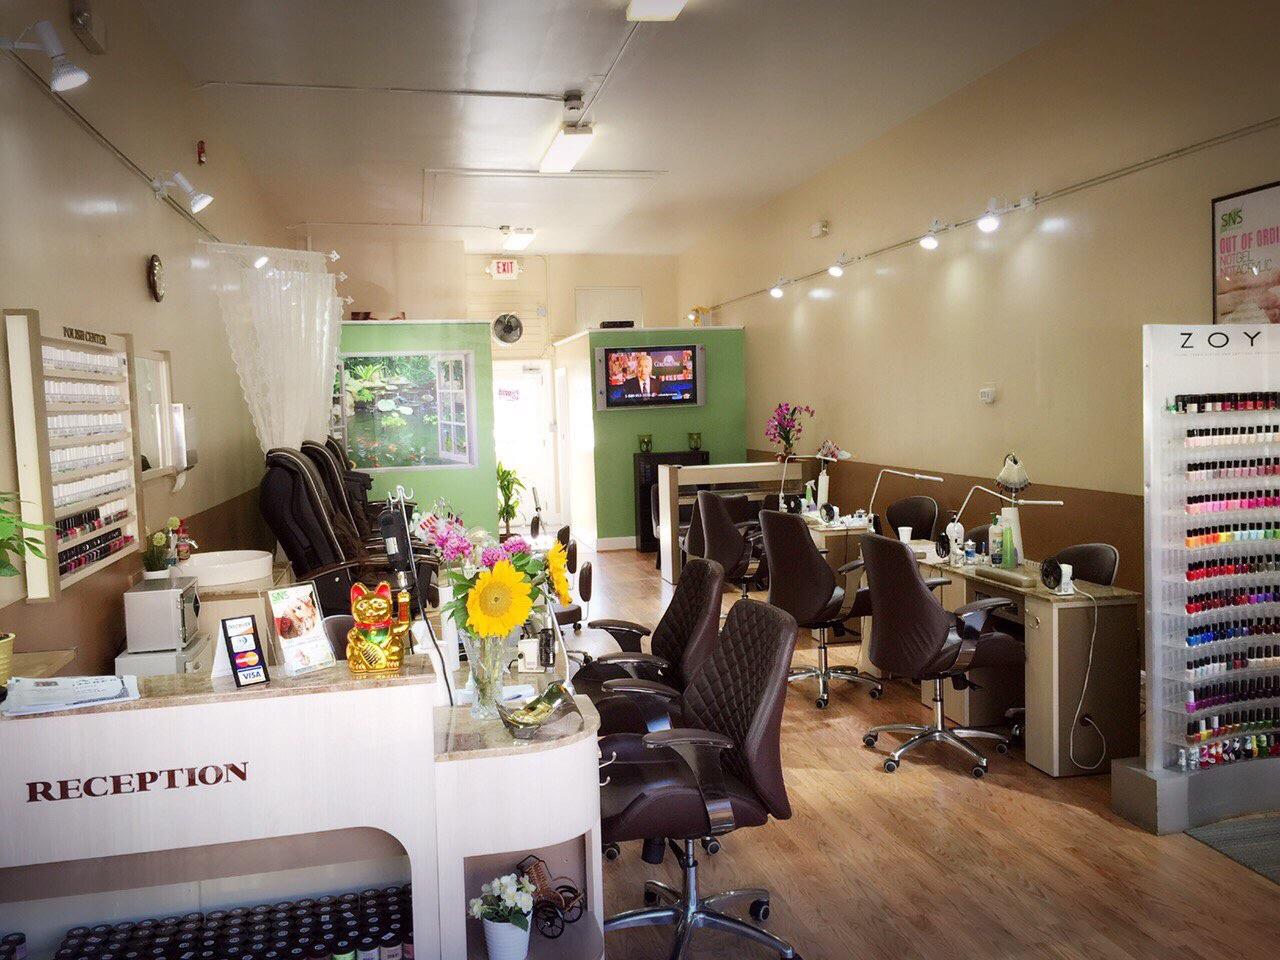 Divine Organic Nail Salon - Nail Salon, Nails, Manicure